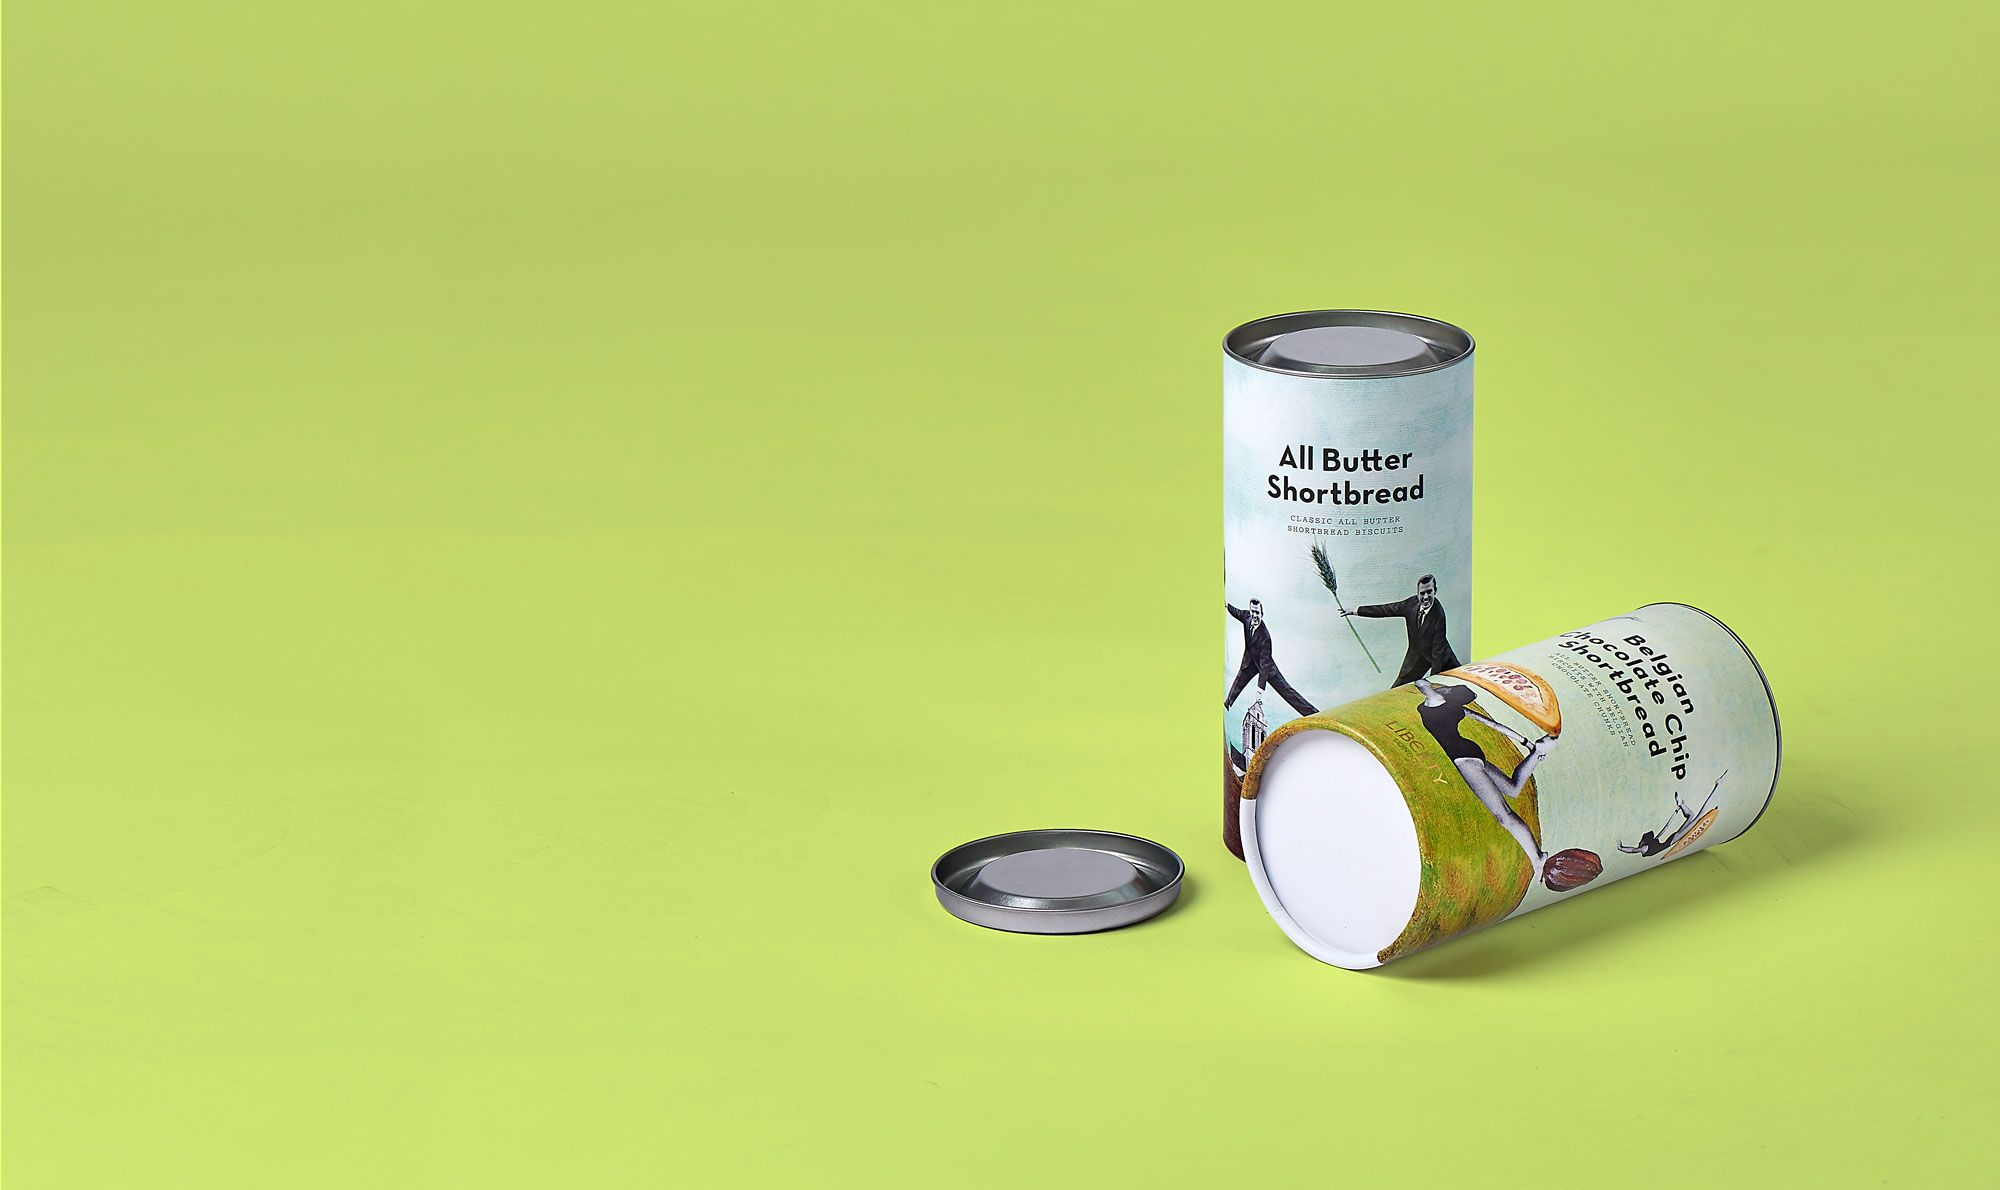 biscuit packaging tubes